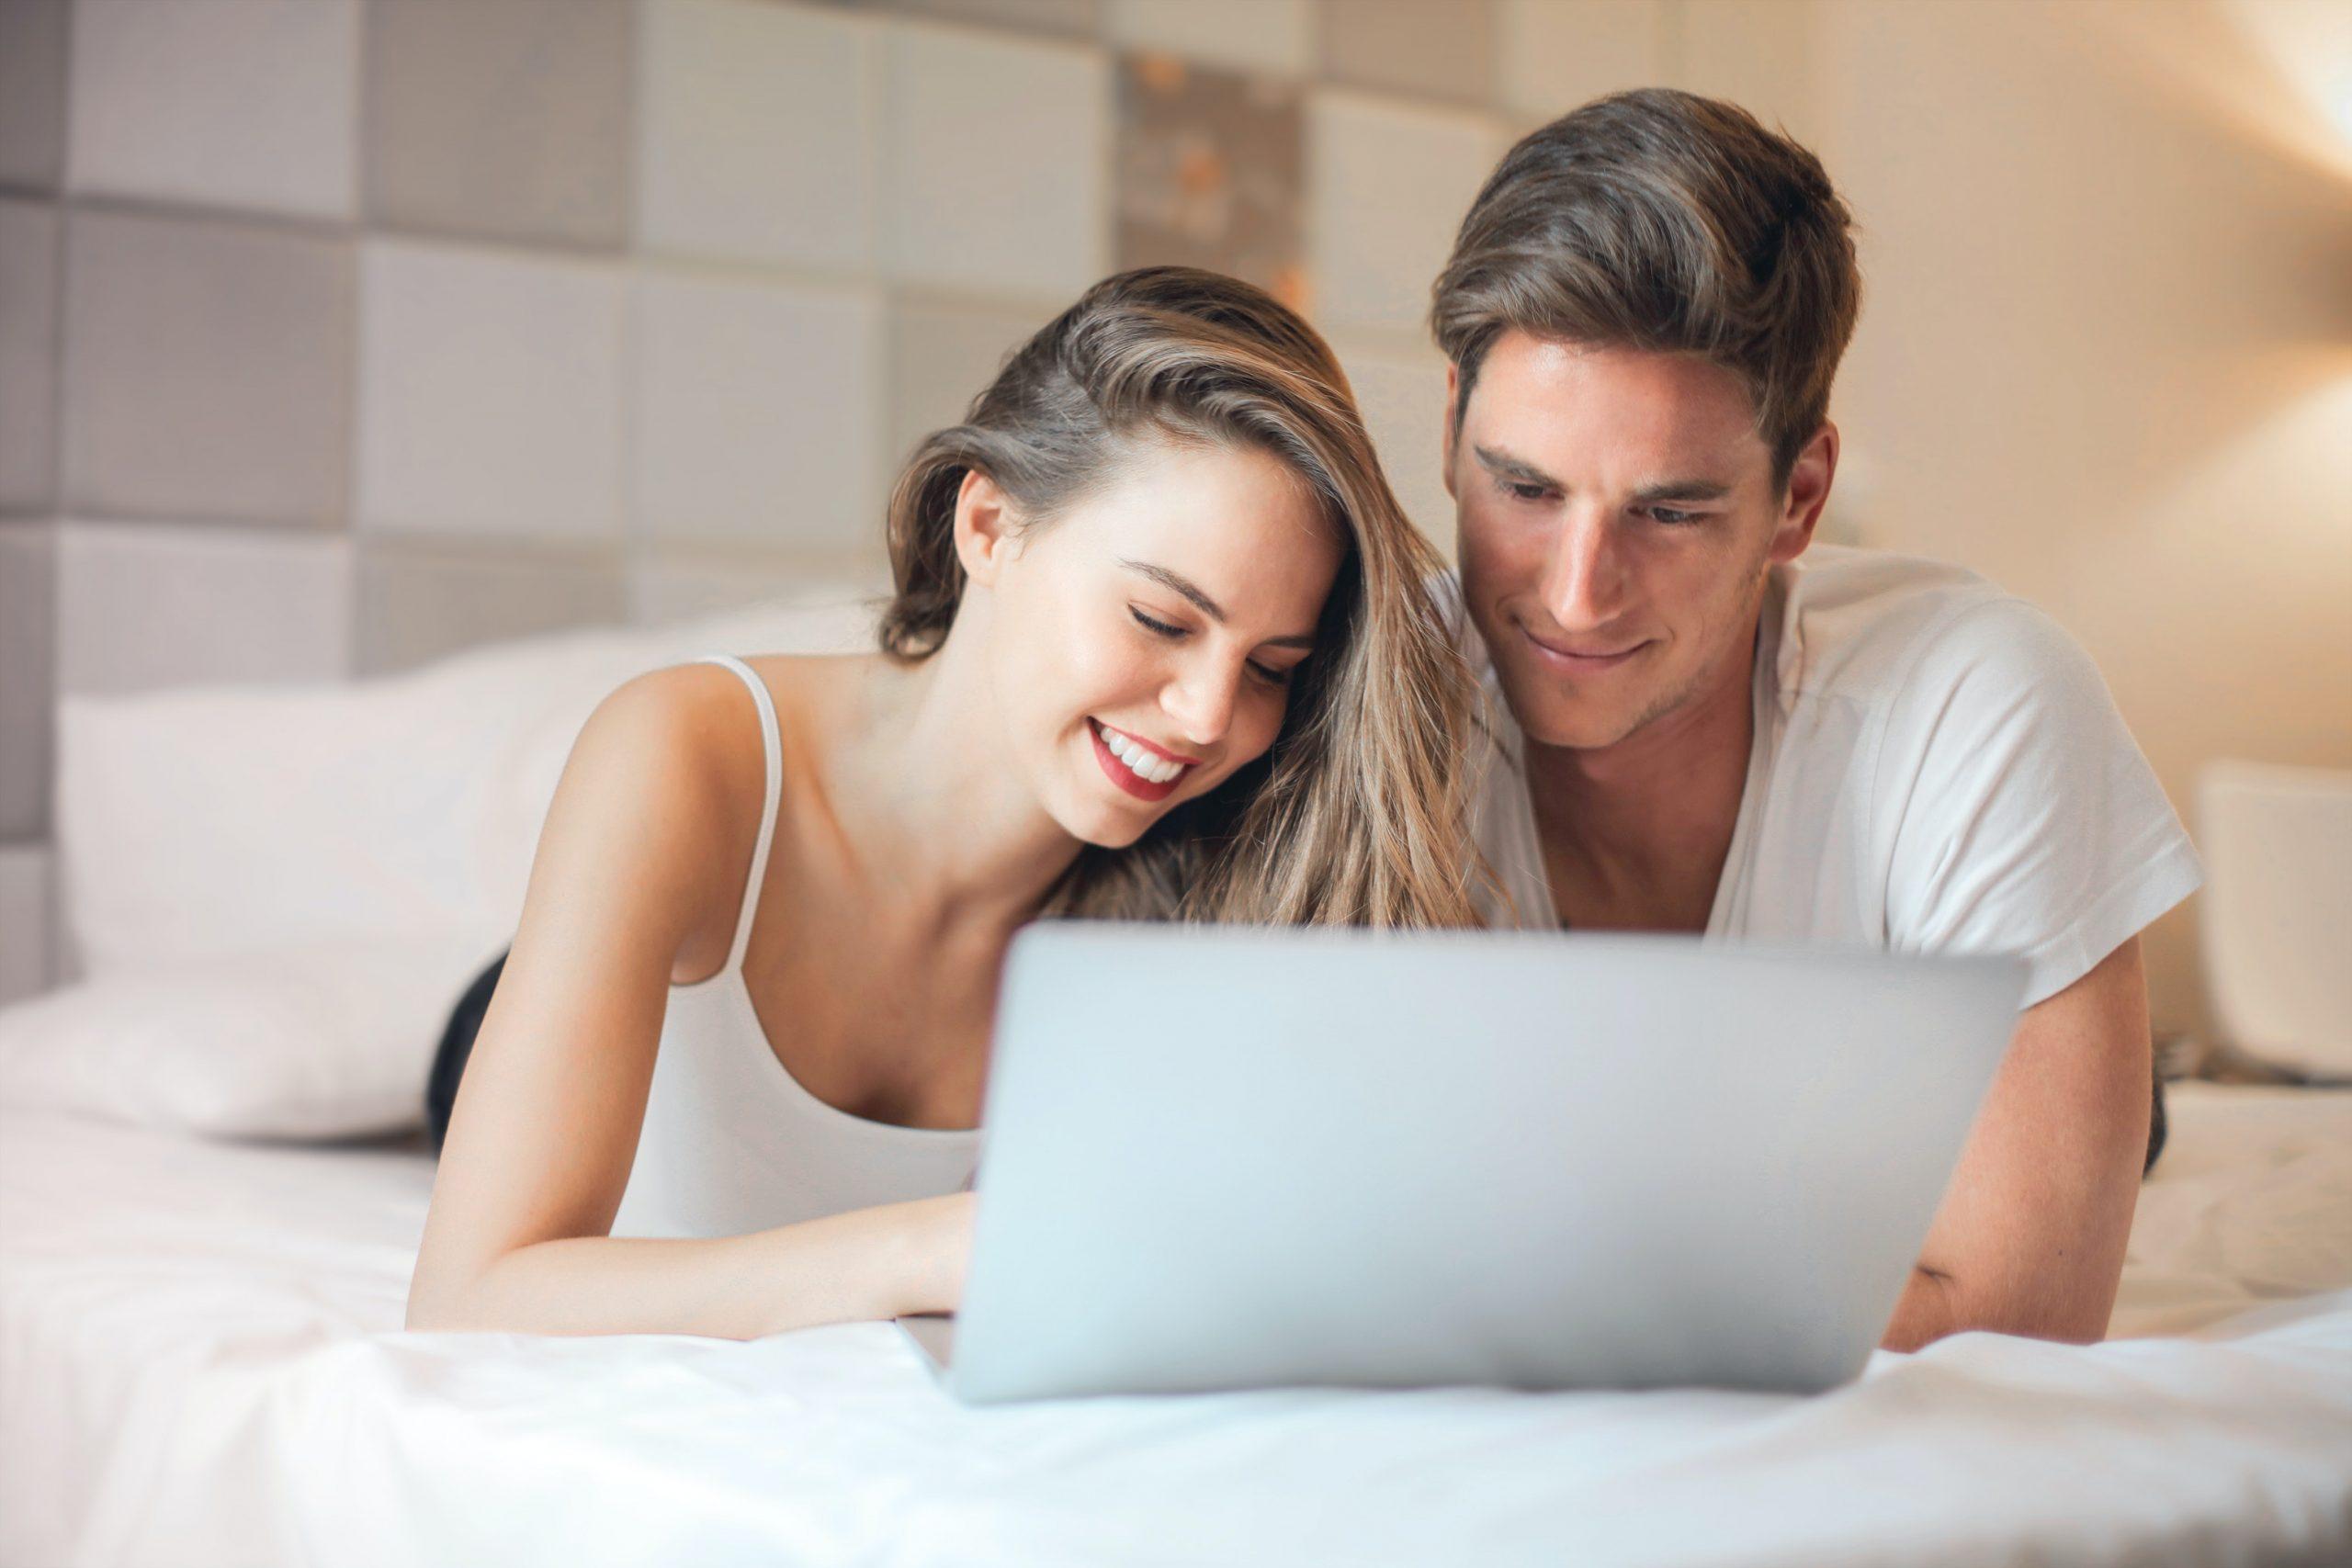 Casal compra lentes de contato deitado na cama através do ecommerce